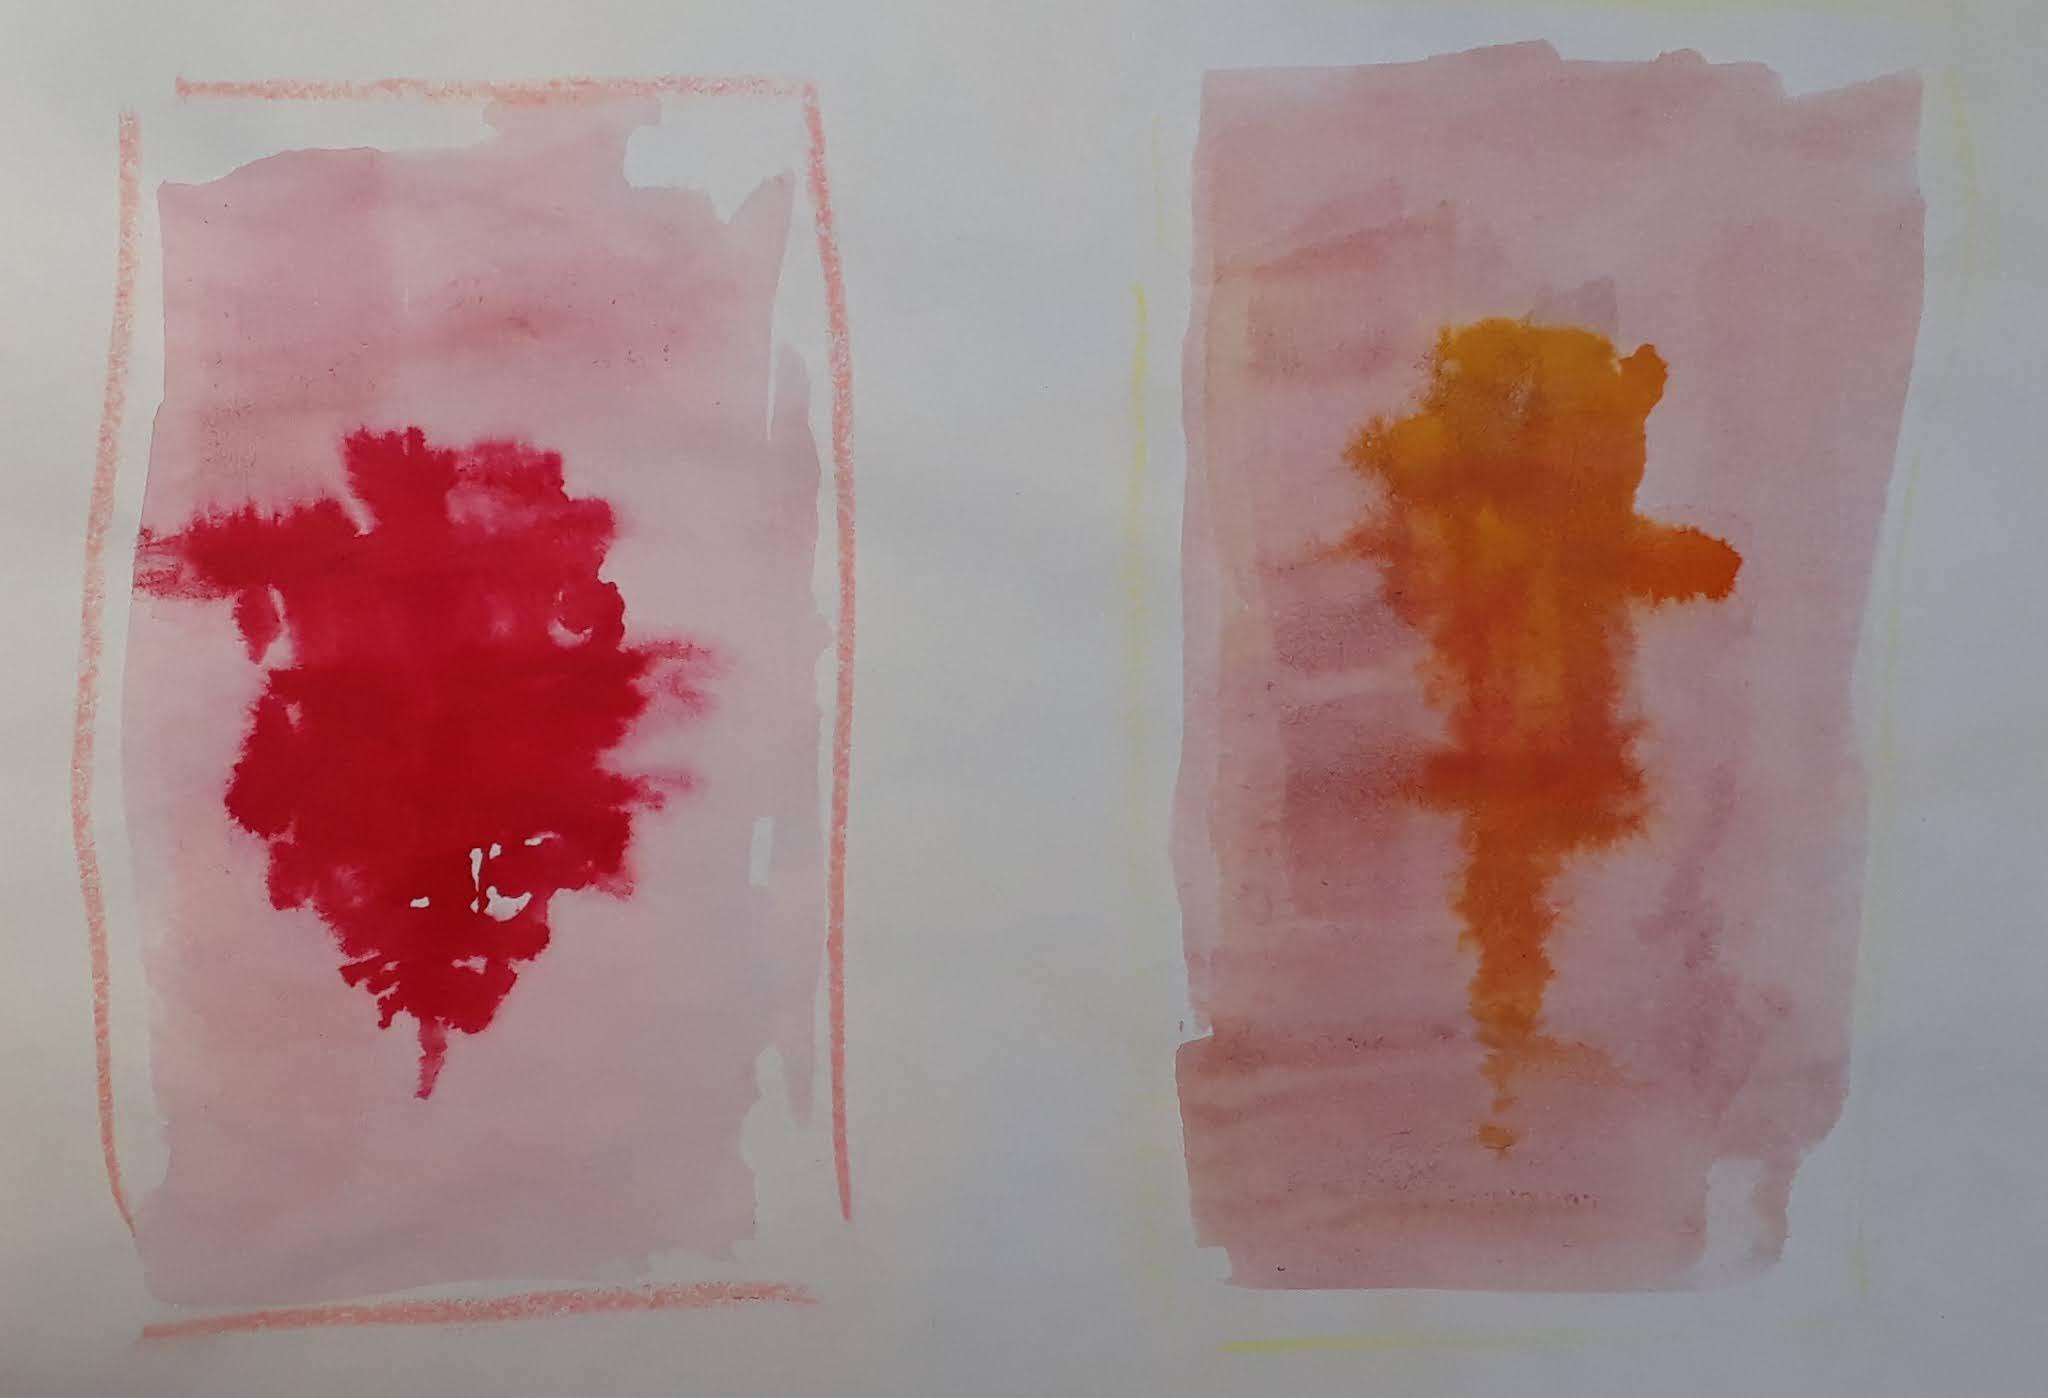 Punajuuri ja porkkana vesiväreillä